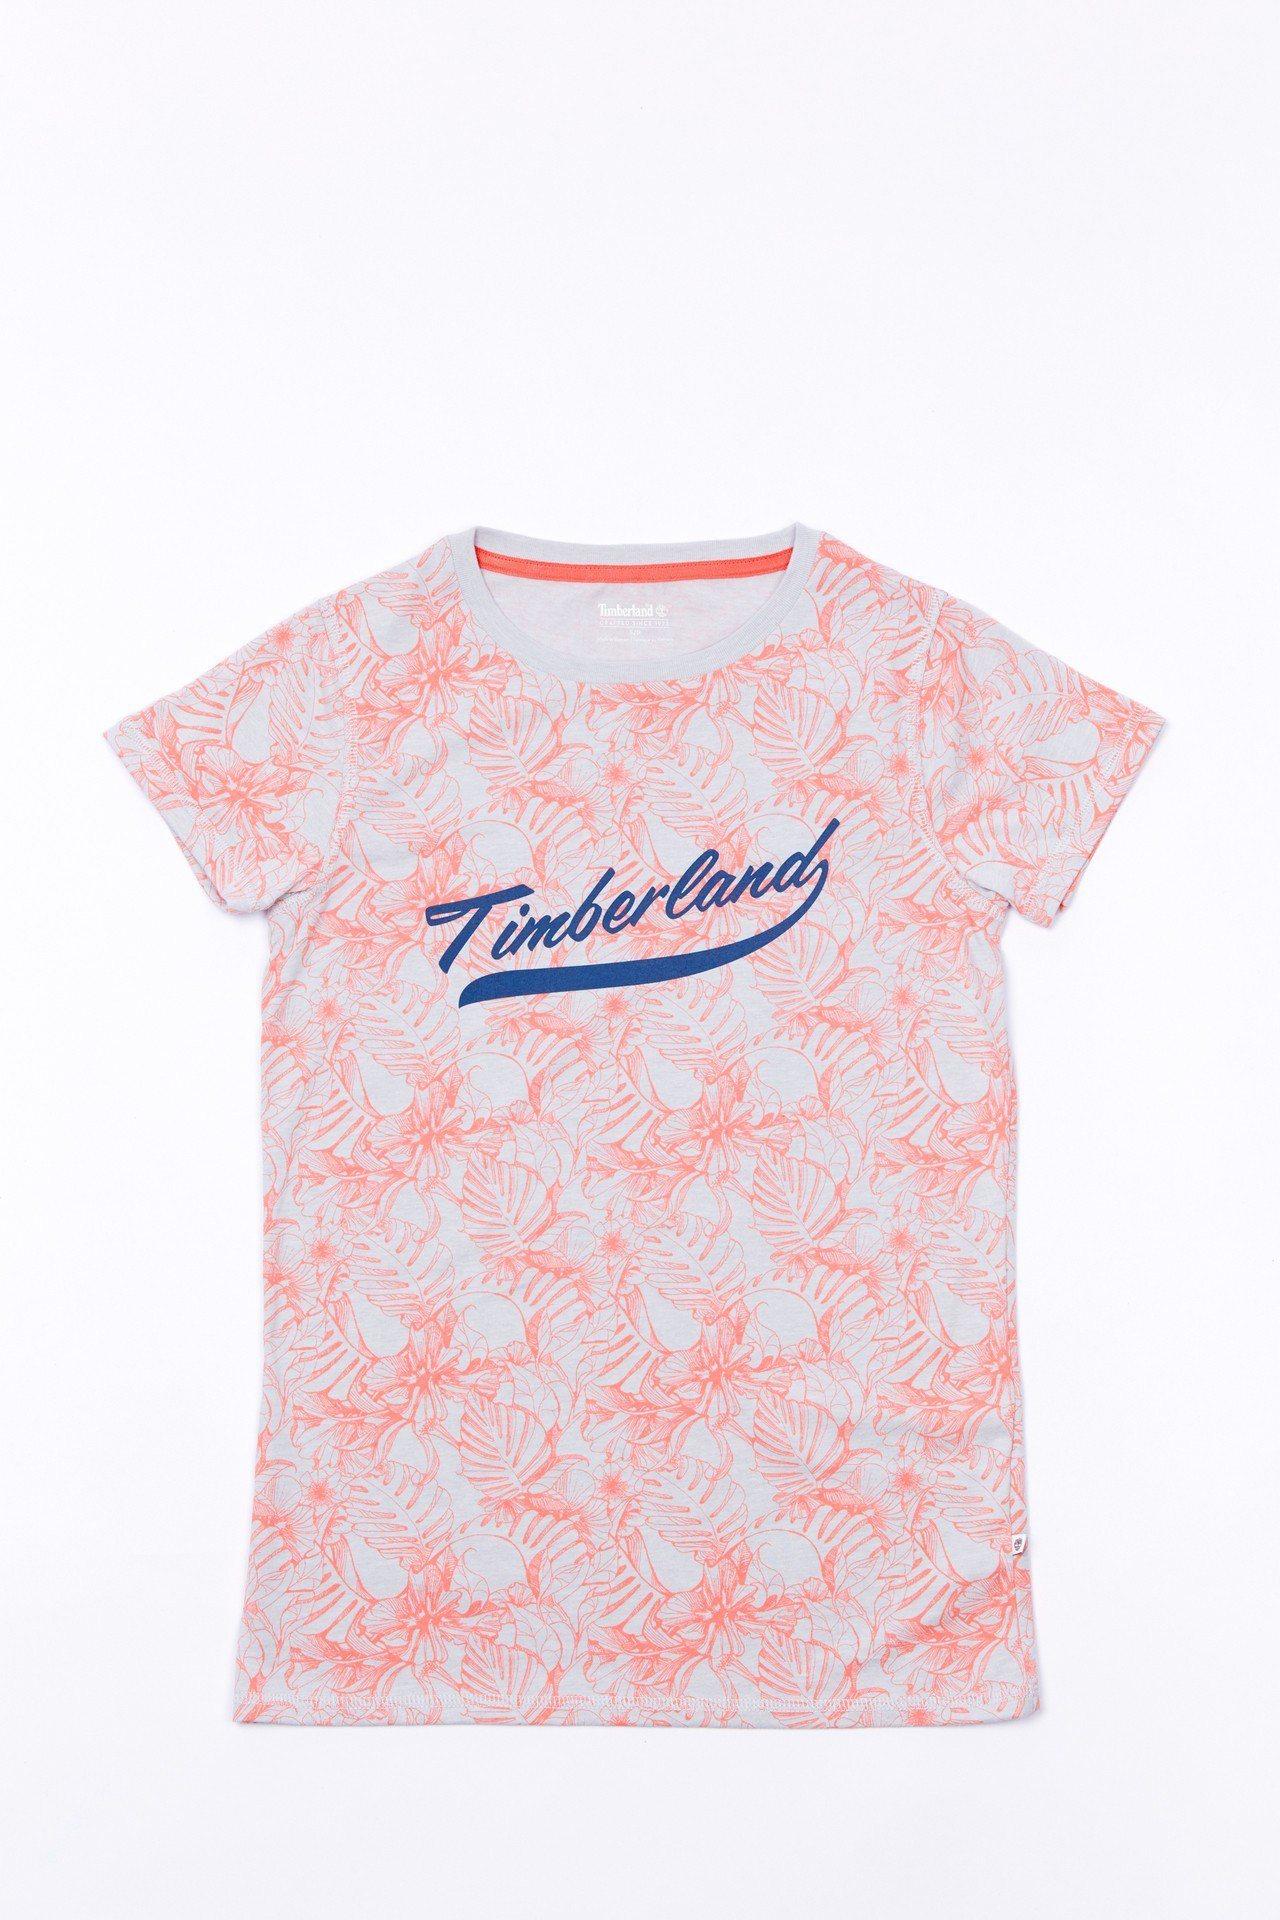 Timberland印花經典Logo T恤,約1,500元。圖/Timberla...